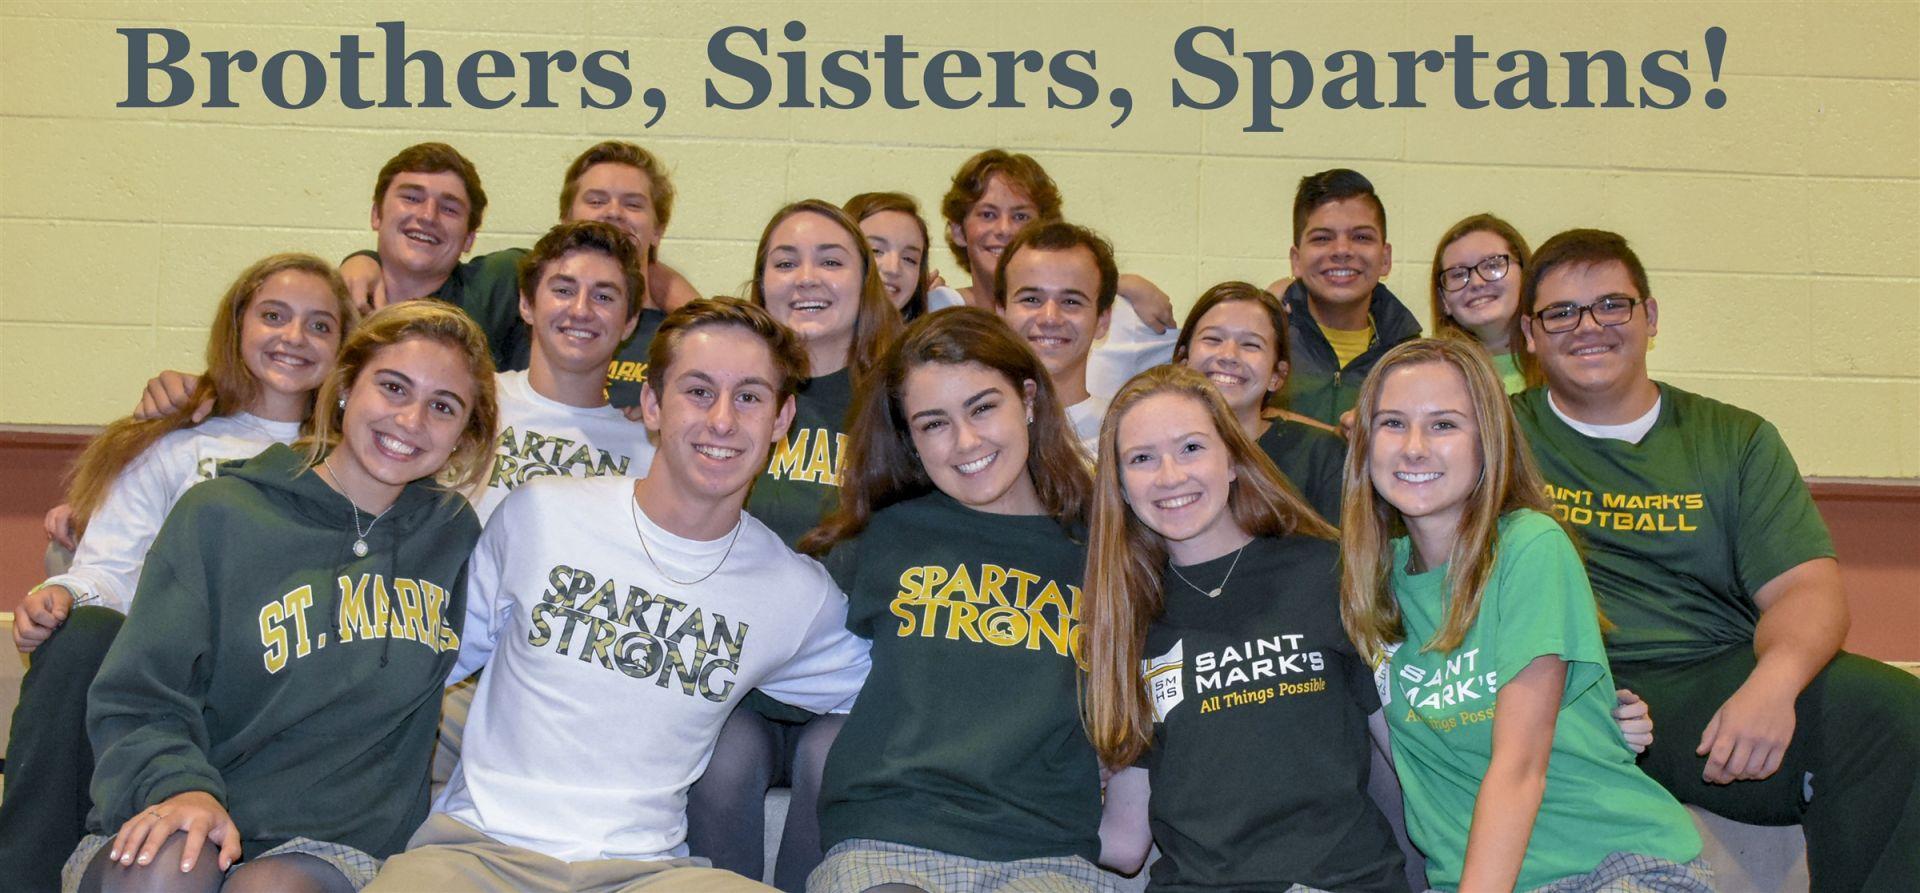 Saint Mark's High School   A Diocesan Catholic School in Wilmington, DE